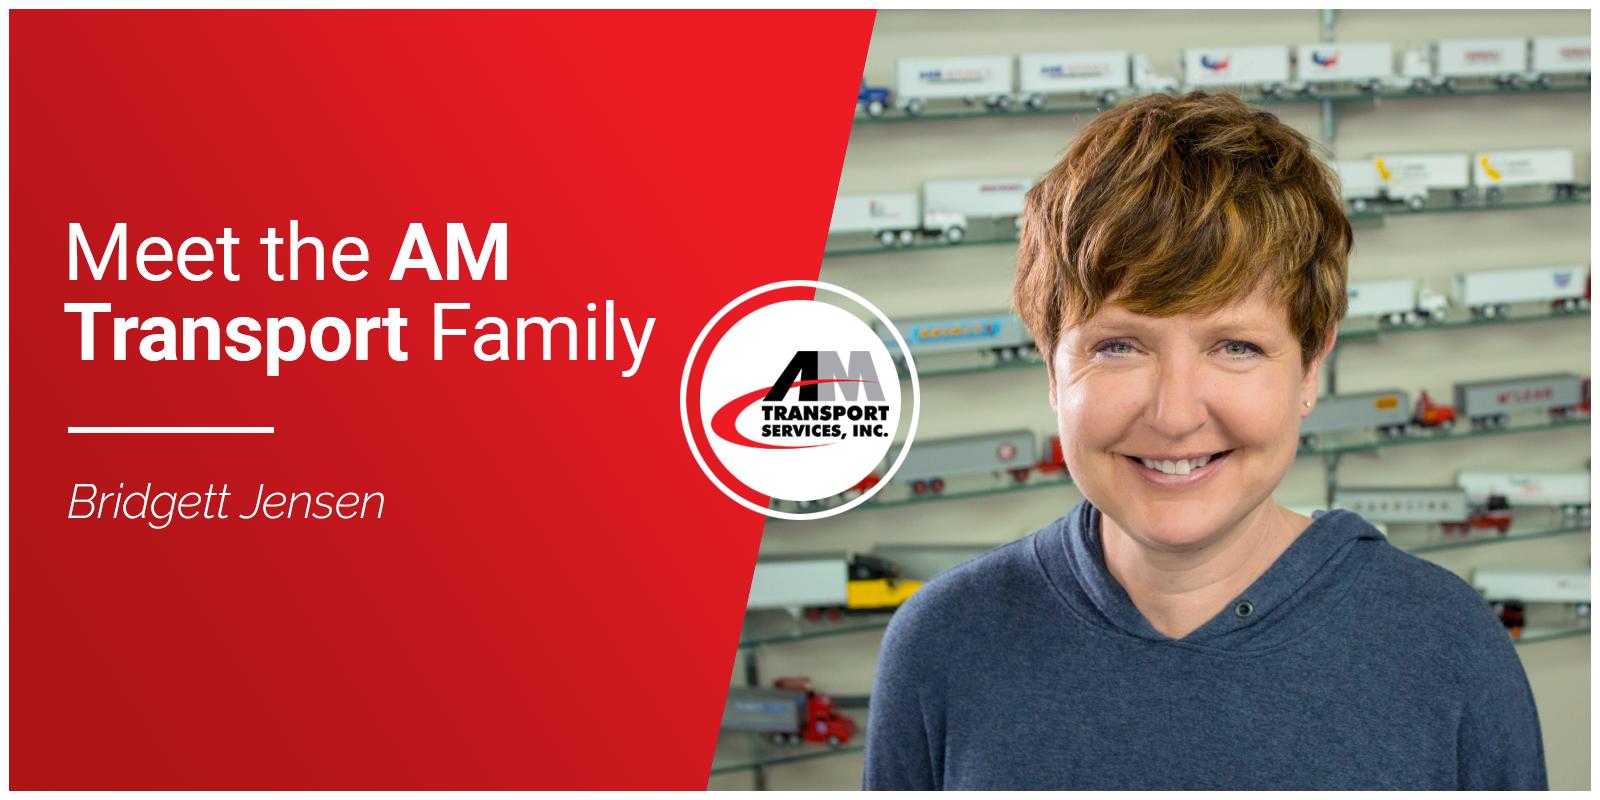 picture of Bridgett Jensen with Meet the AM Transport Family